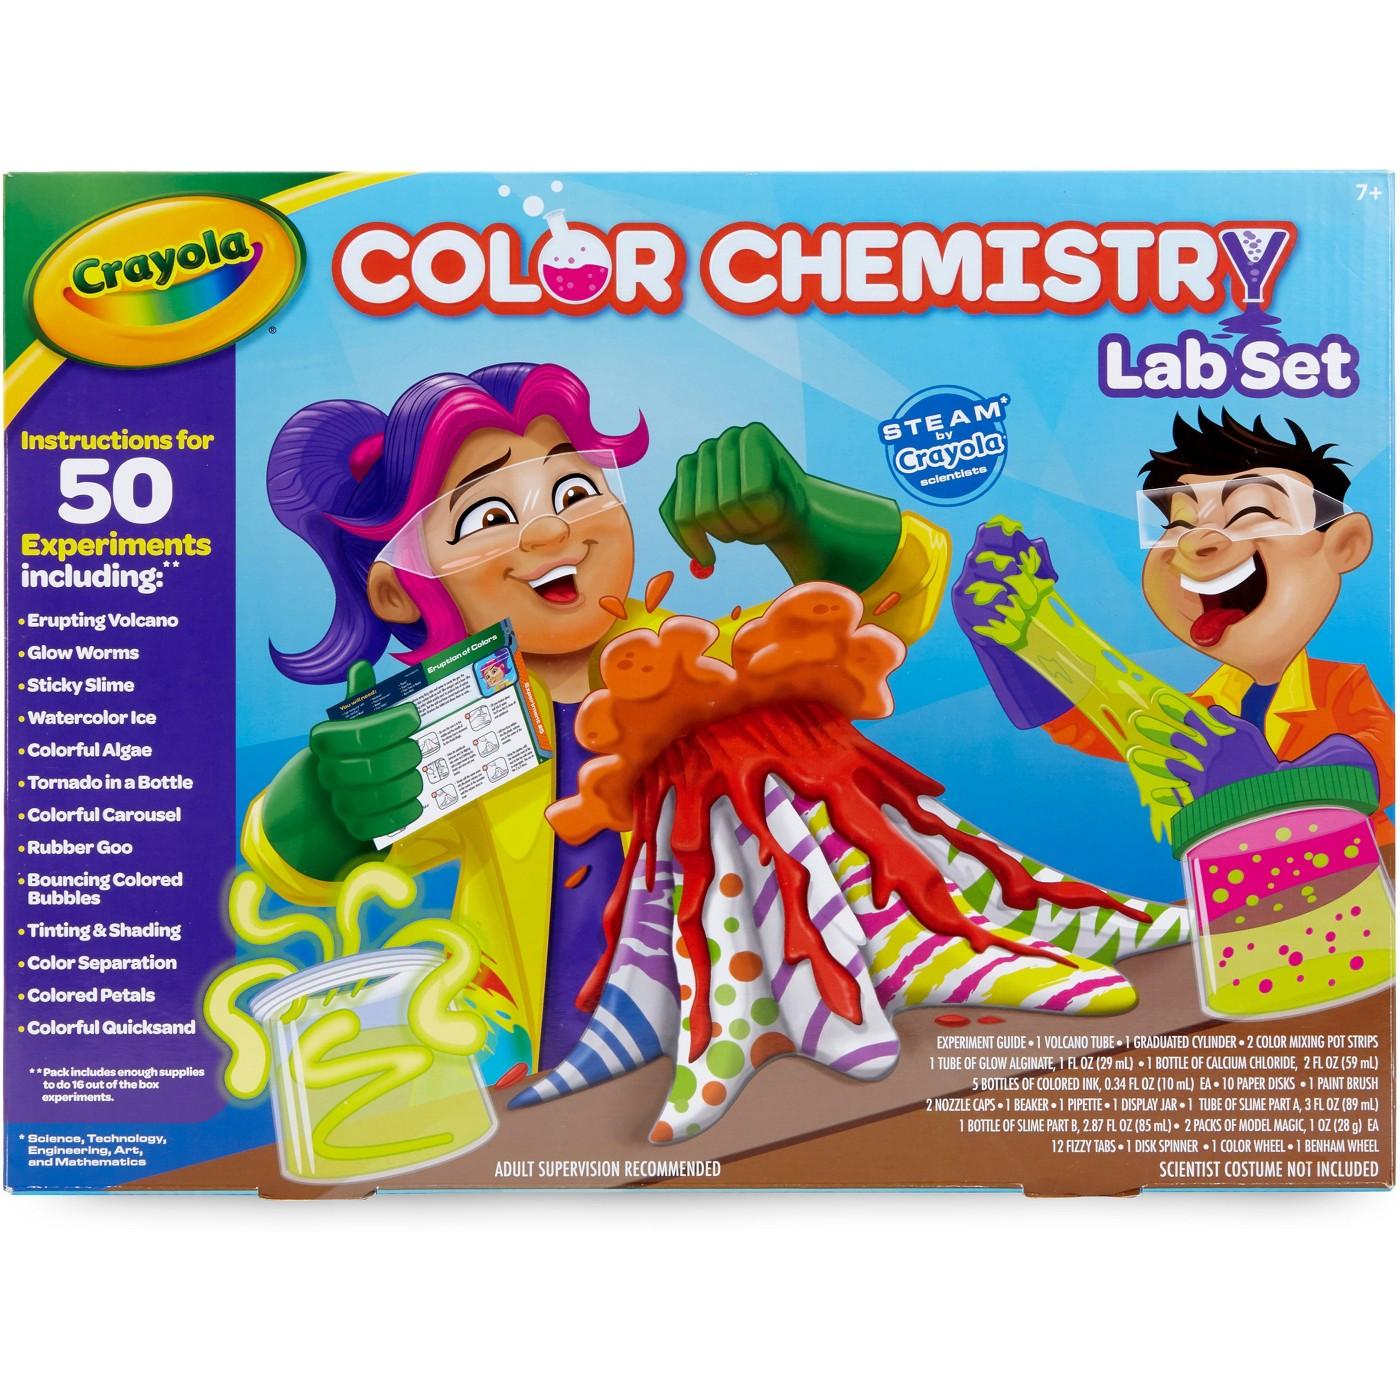 TargetCartwheel: Crayola Color Chemistry Lab set for Kids, Steam/STEM Activities $17.49 + Free store pickup